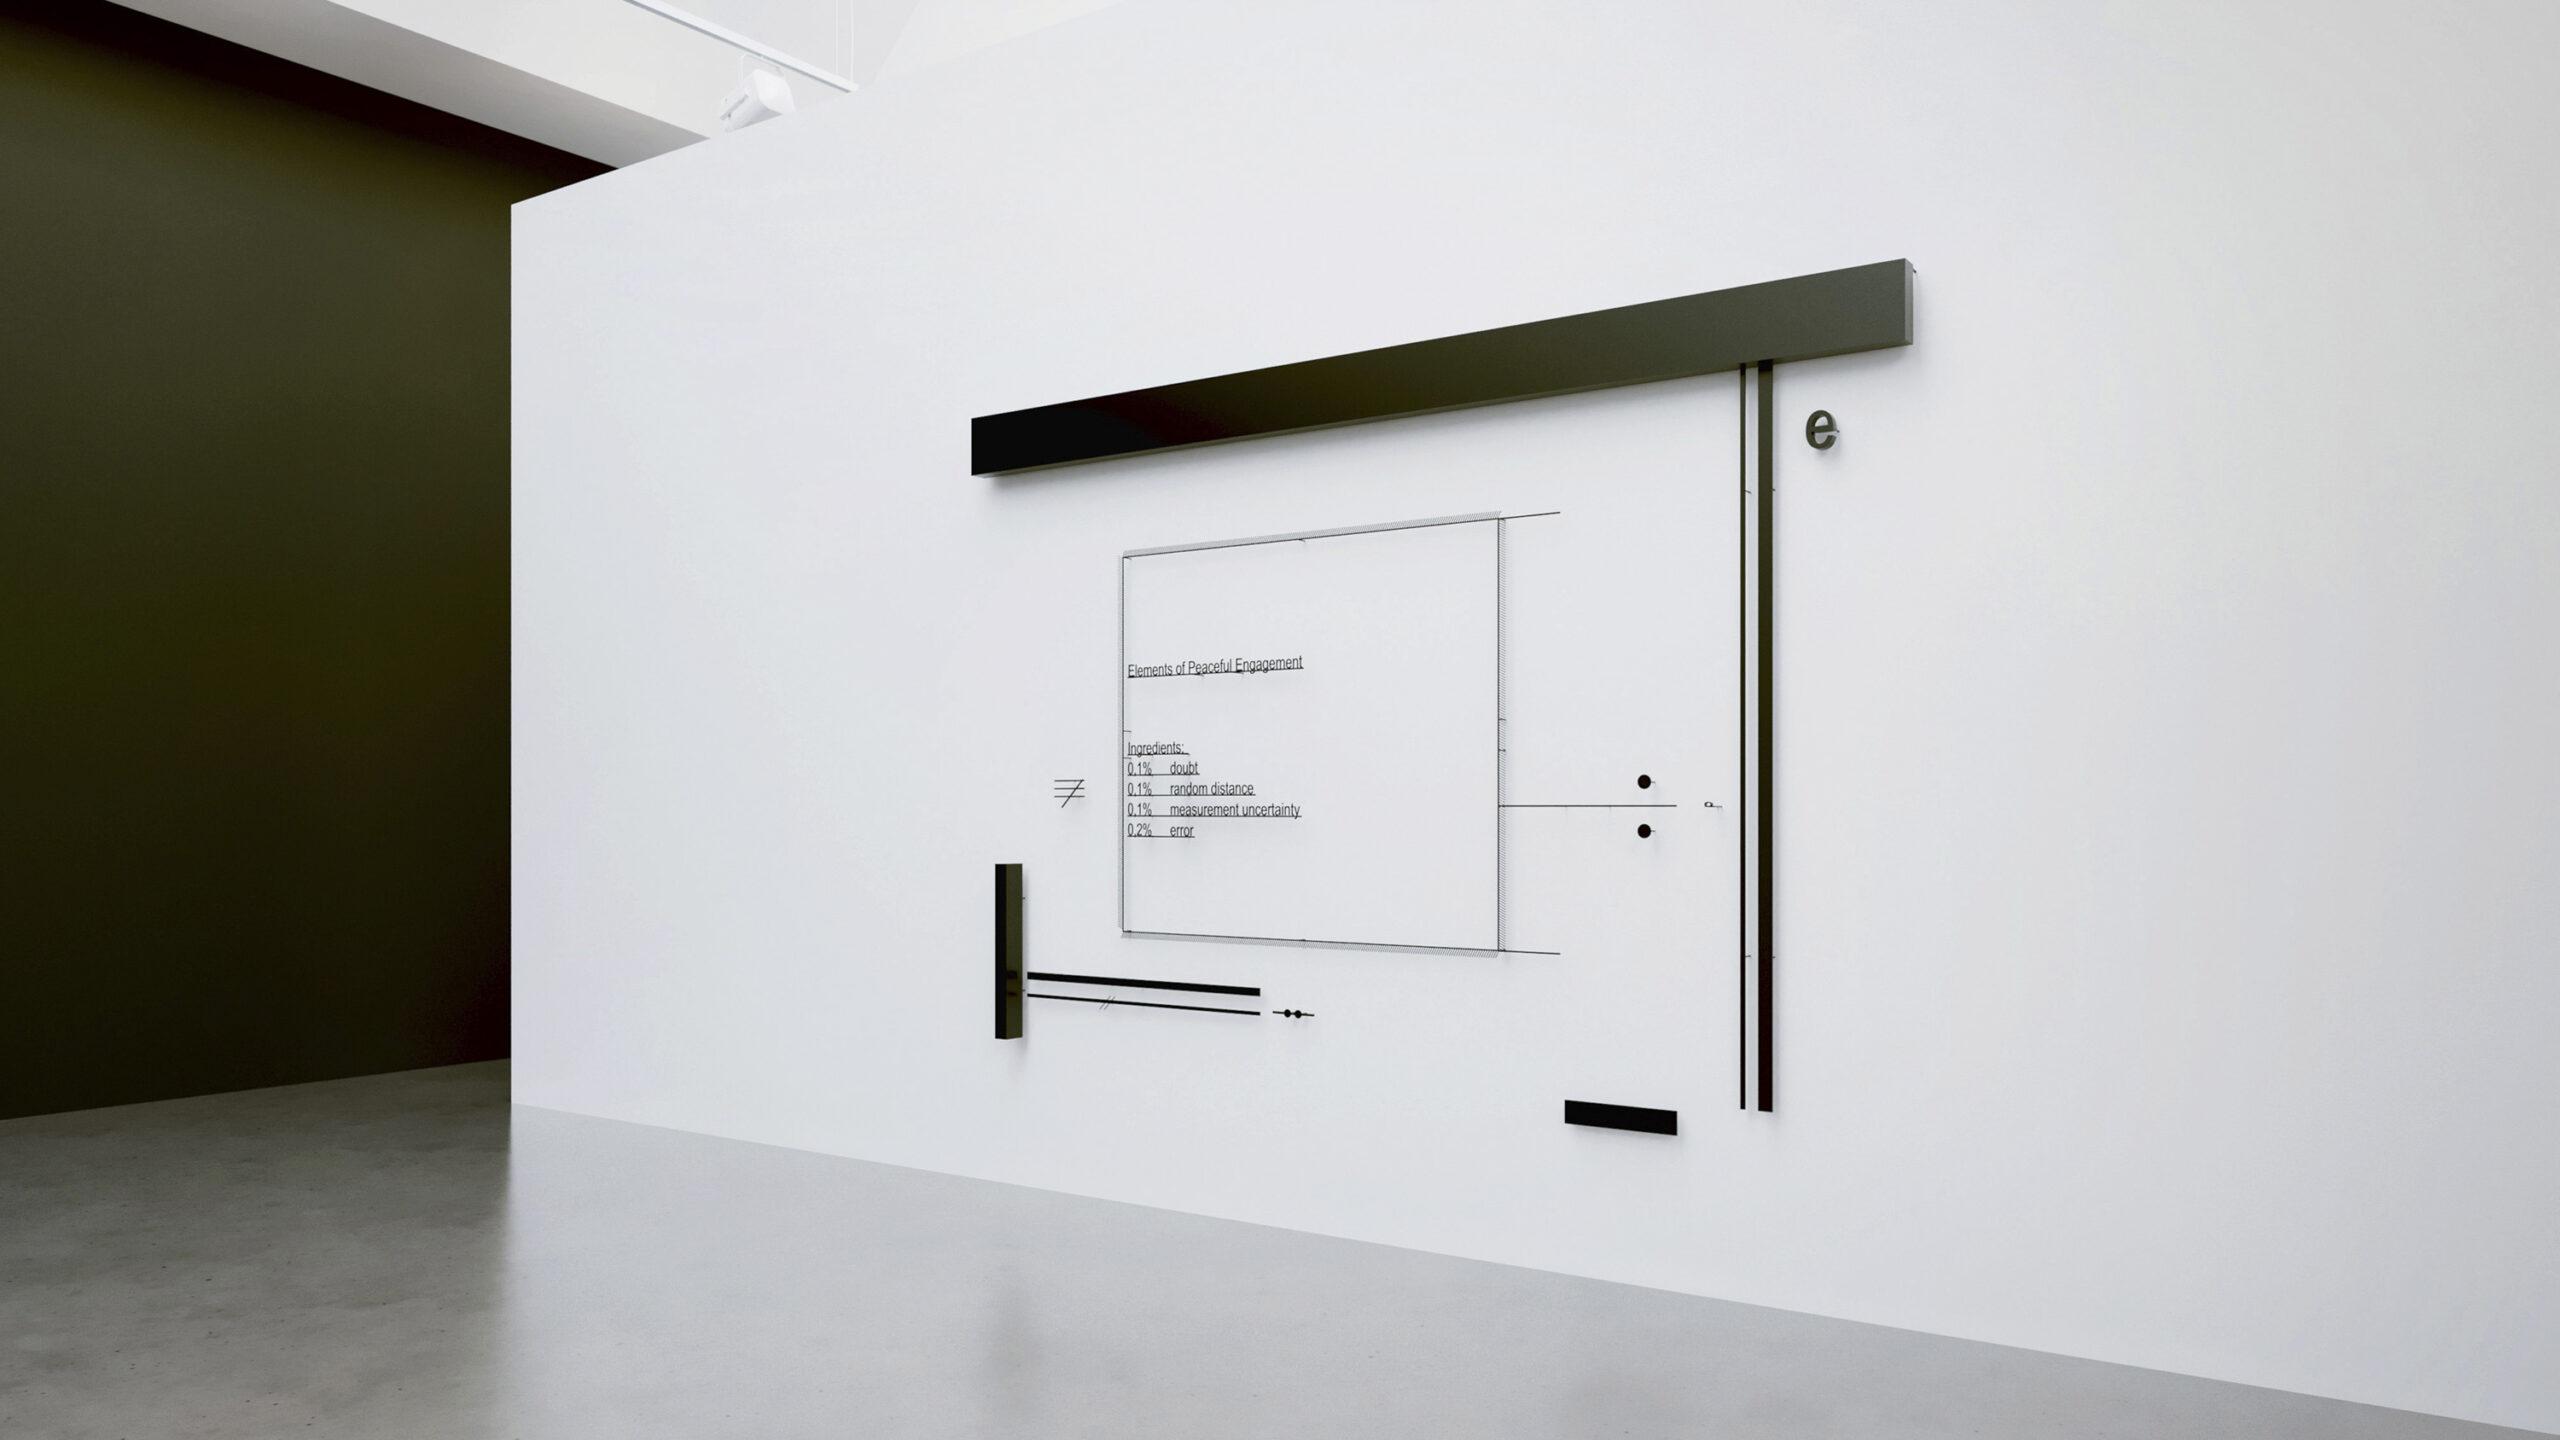 Marlena Kudlicka, Elements of Peaceful Engagement. receipt, 2020, wall sculpture, 168 x 240 x 7cm, powdercoated steel, © Marlena Kudlicka, courtesy: Barbara Thumm